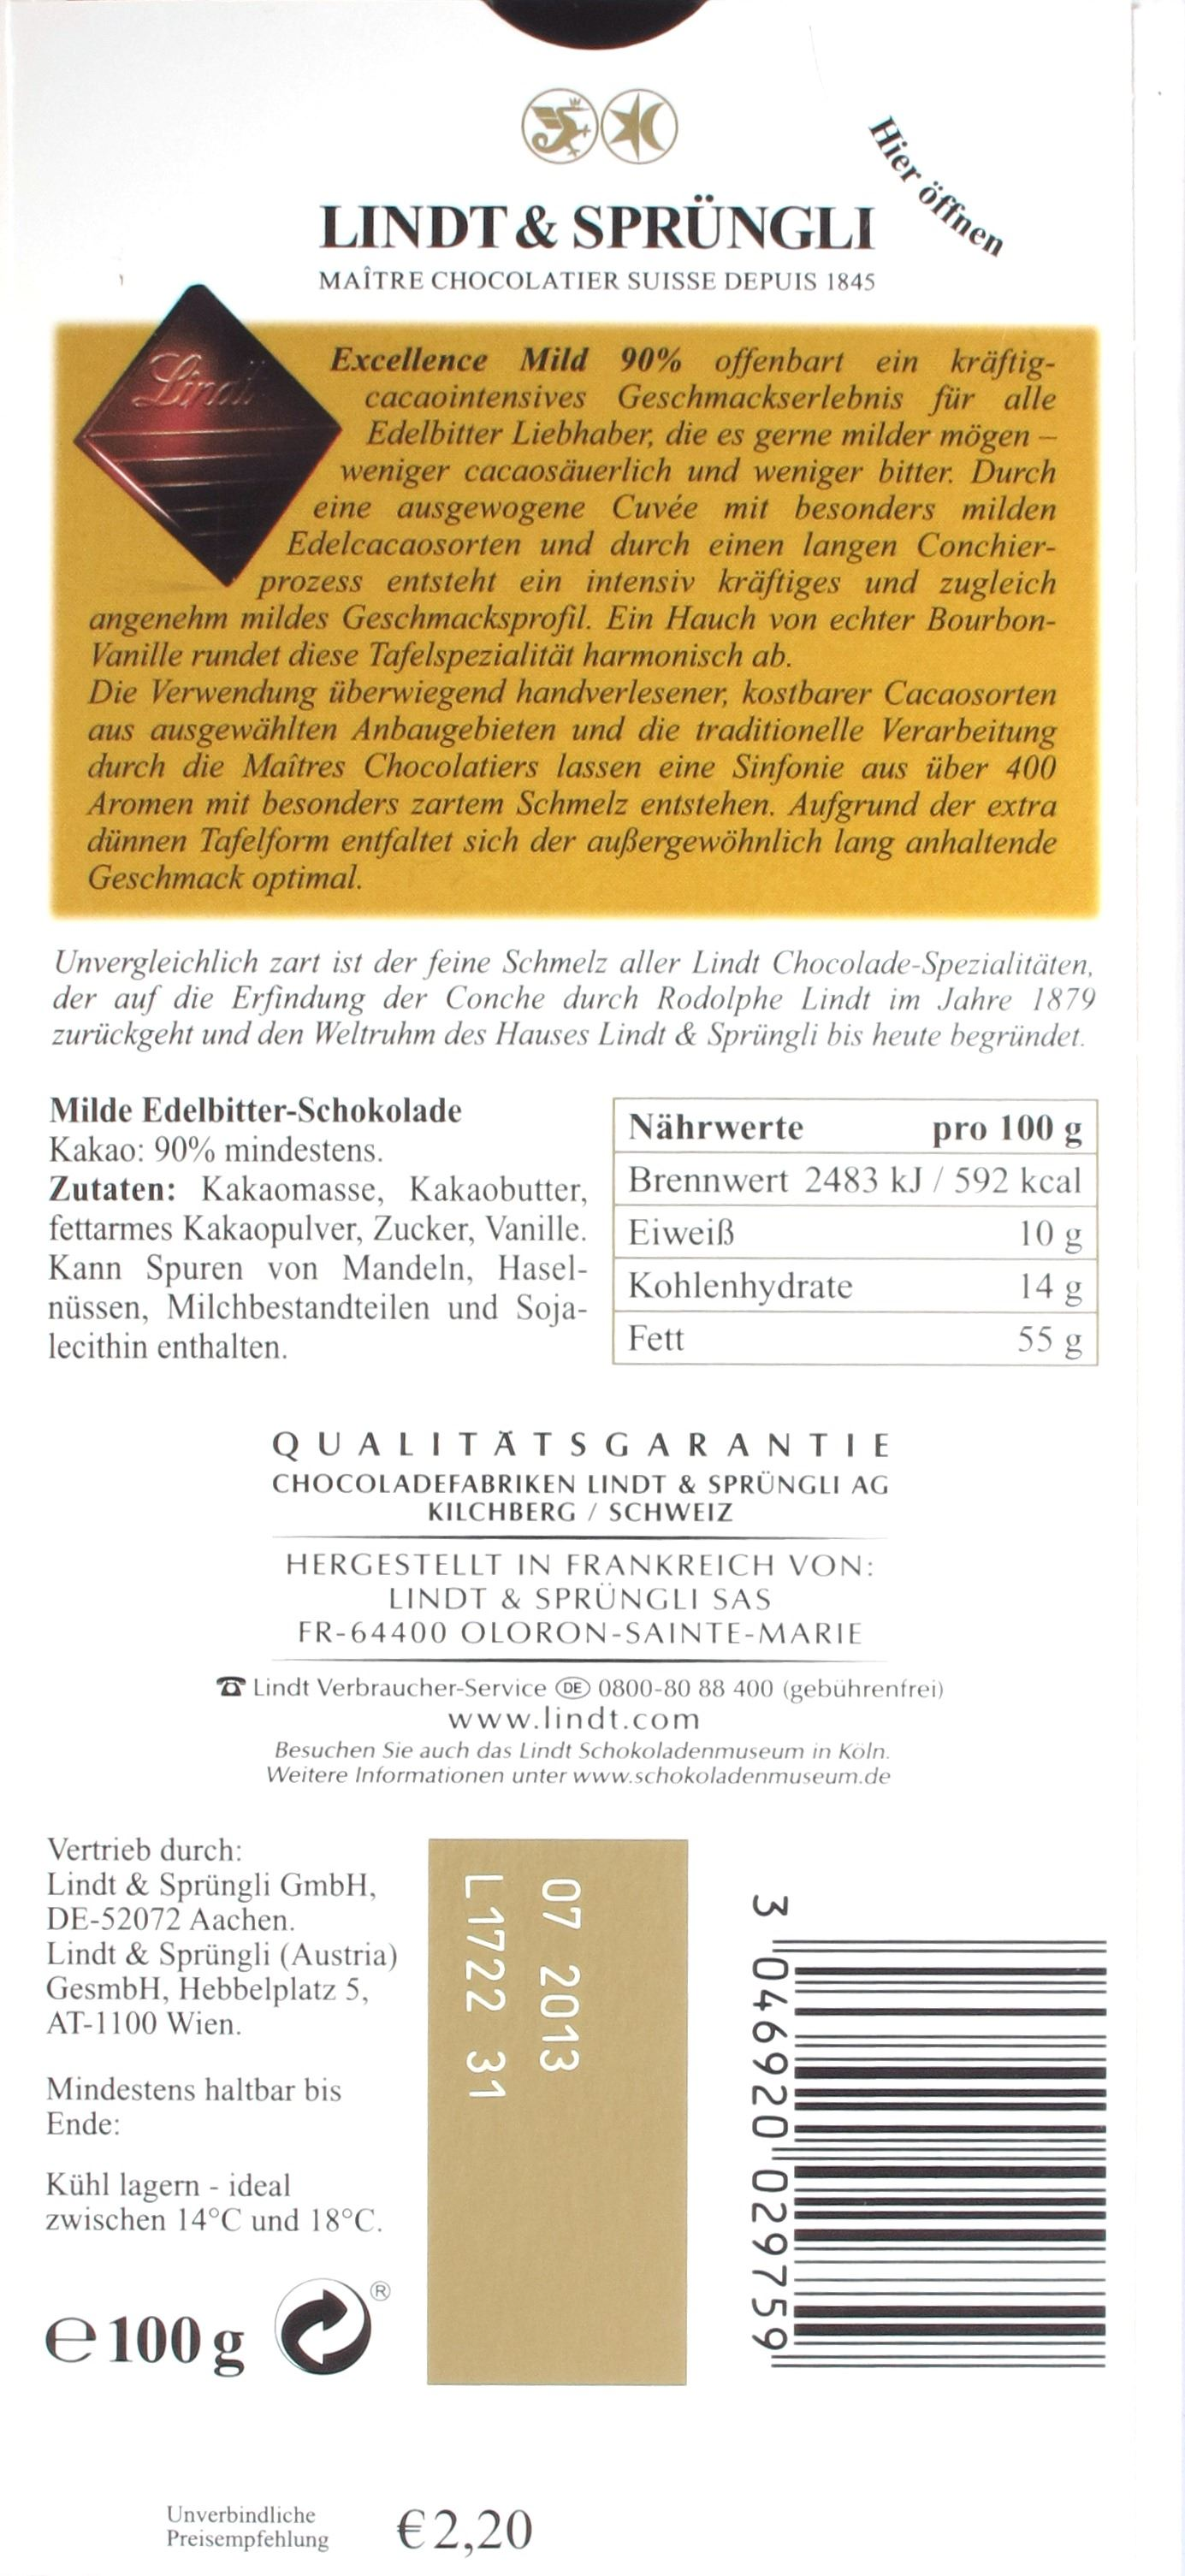 Lindt Excellence Edelbitter 90% Mild, Rückseite